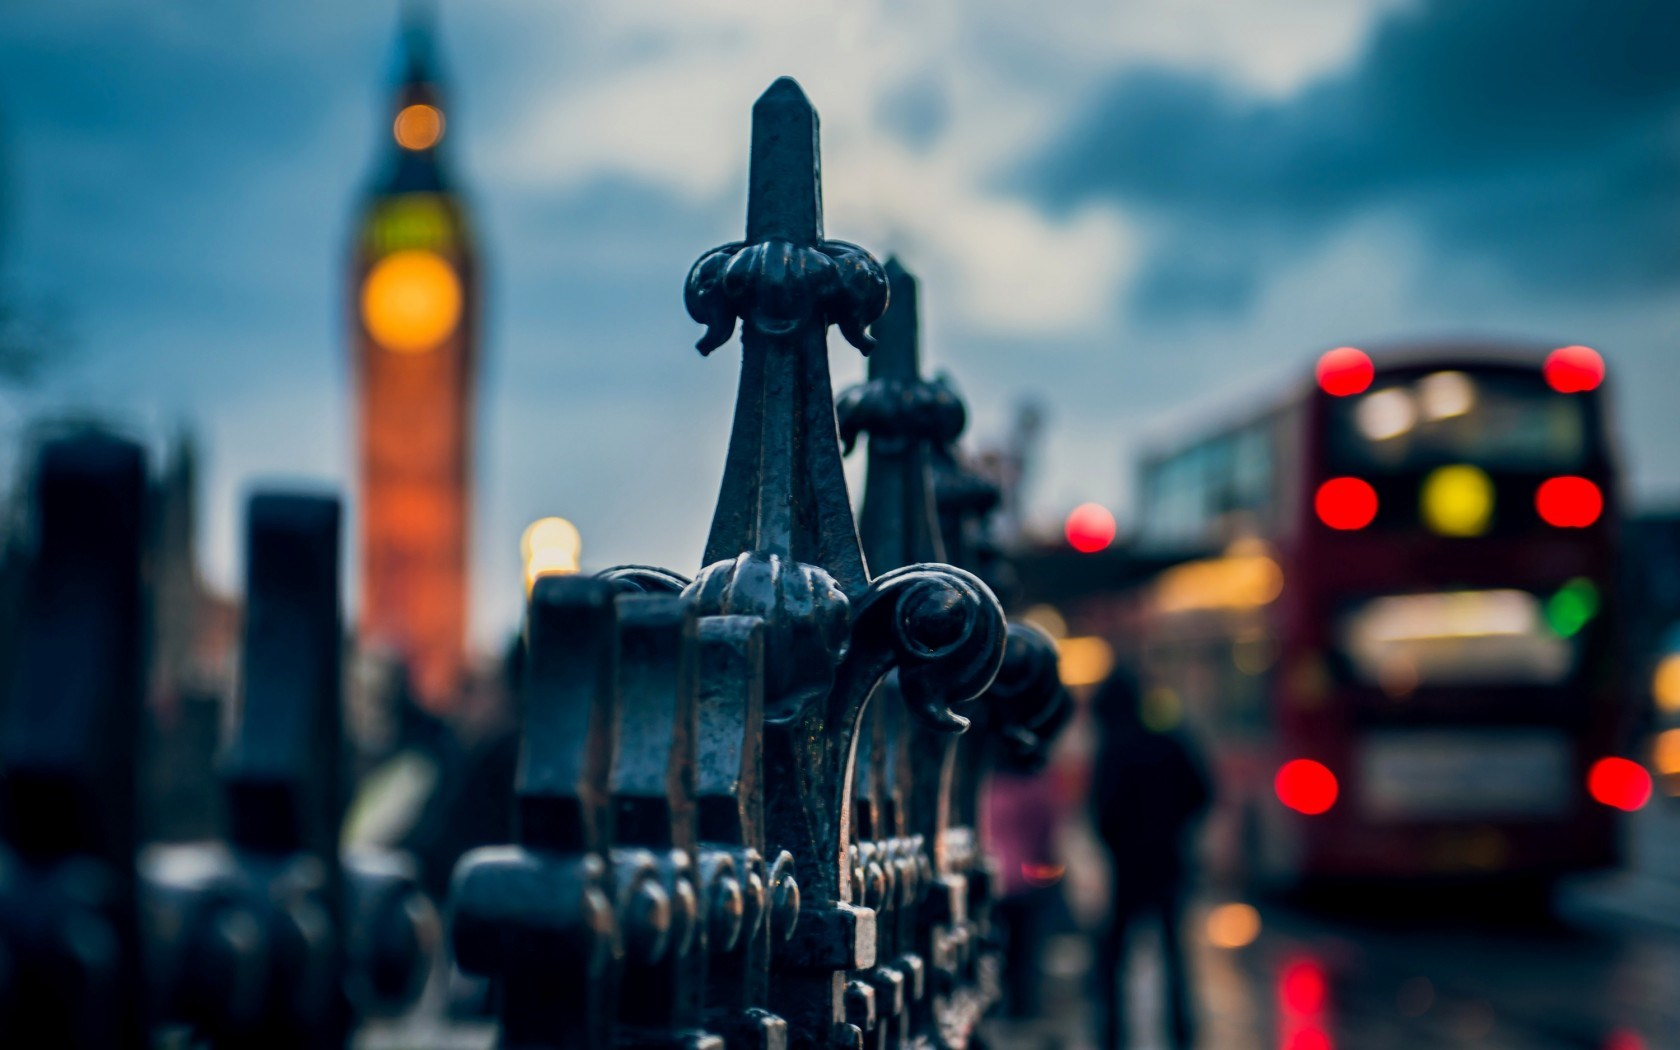 city evening fence london big ben macro photo bus lights 1680x1050